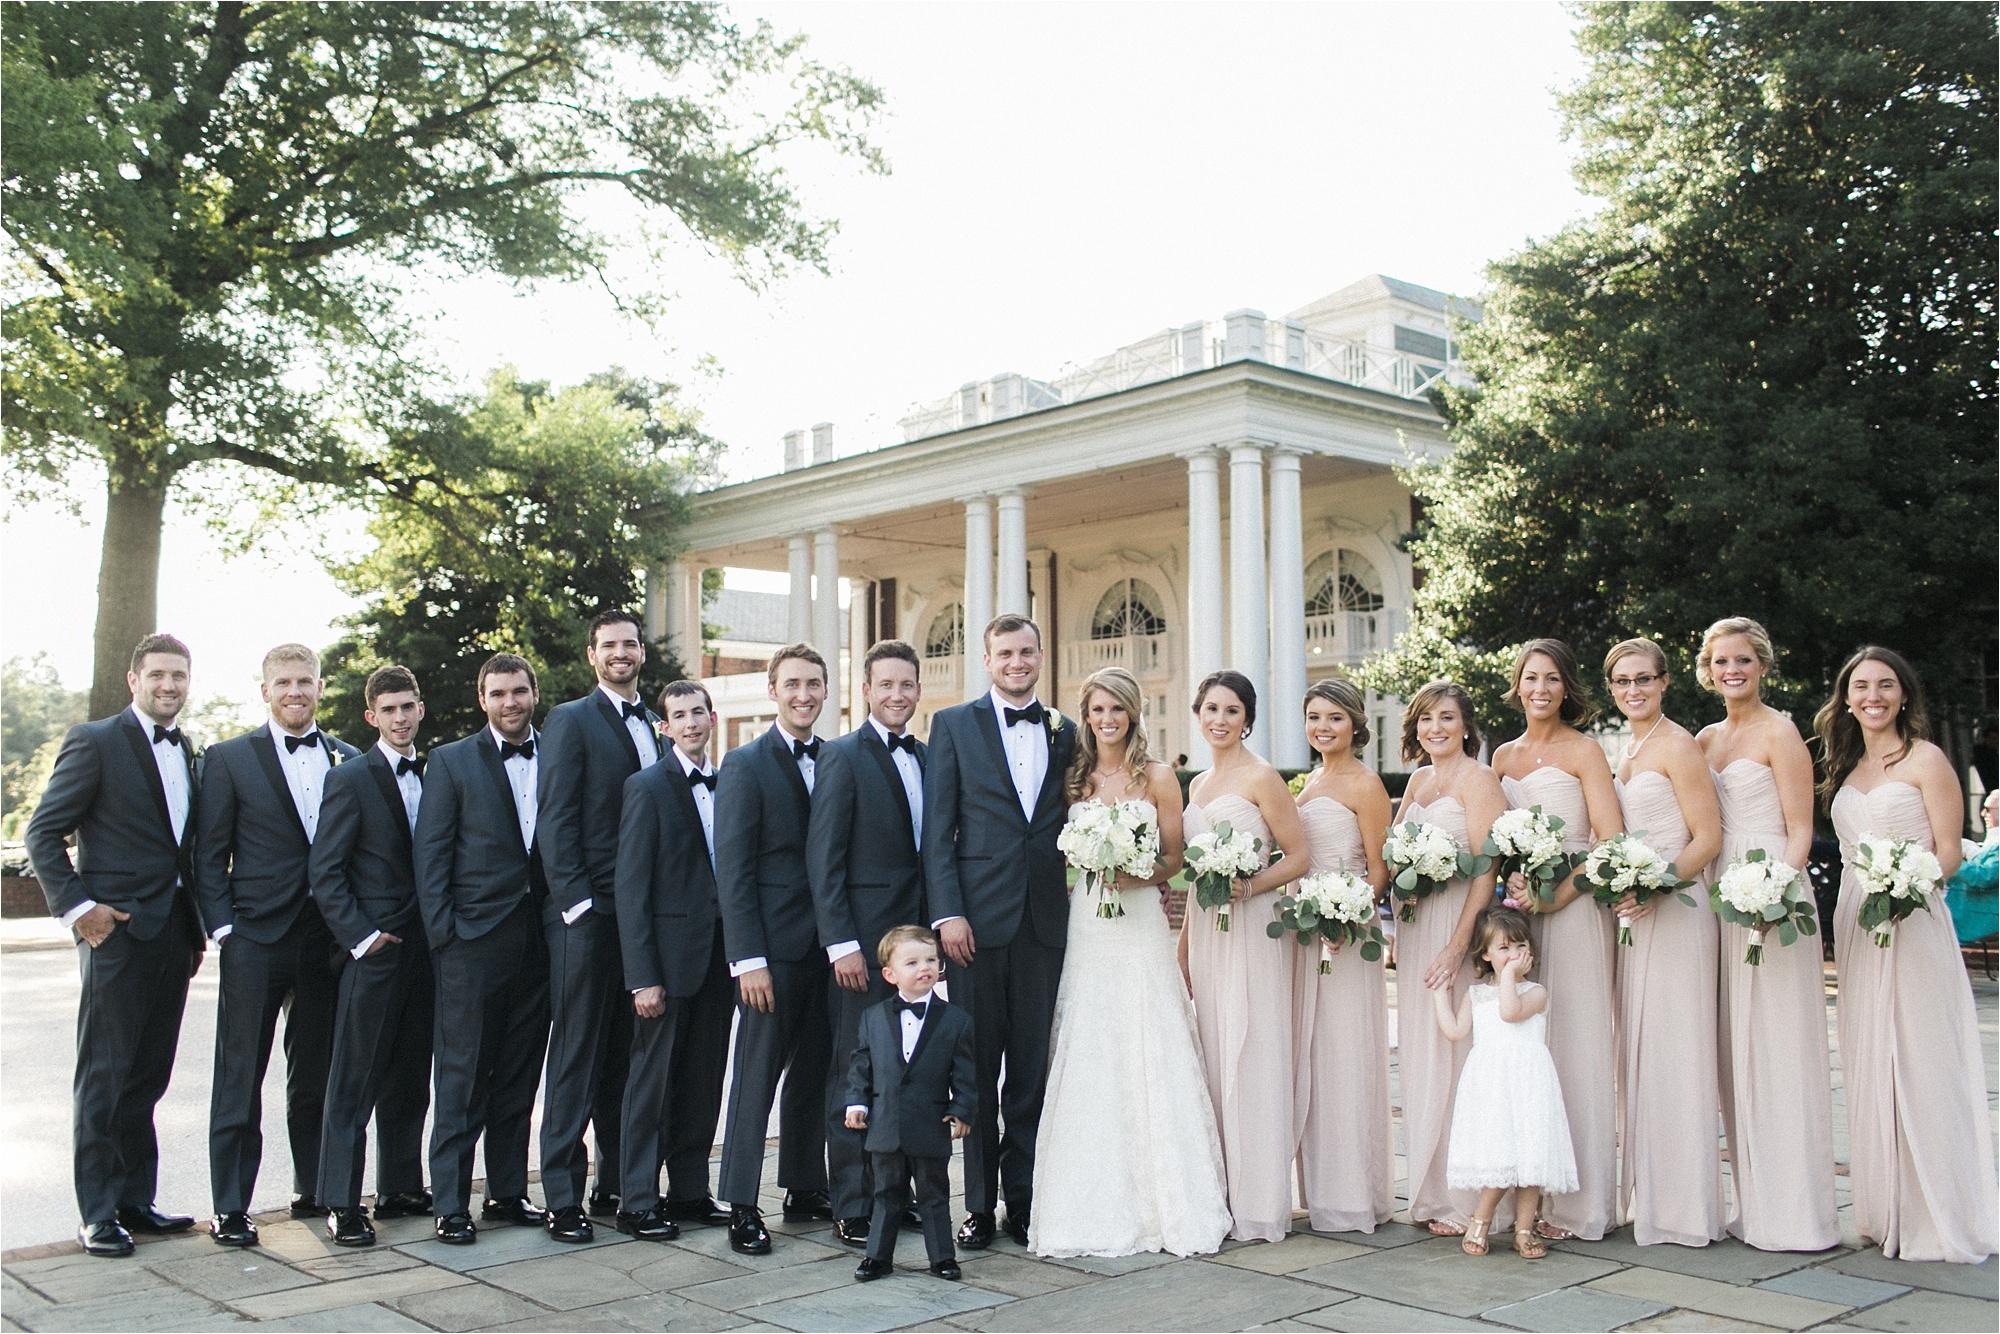 stephanie-yonce-photography-richmond-virginia-country-club-wedding_0027.jpg